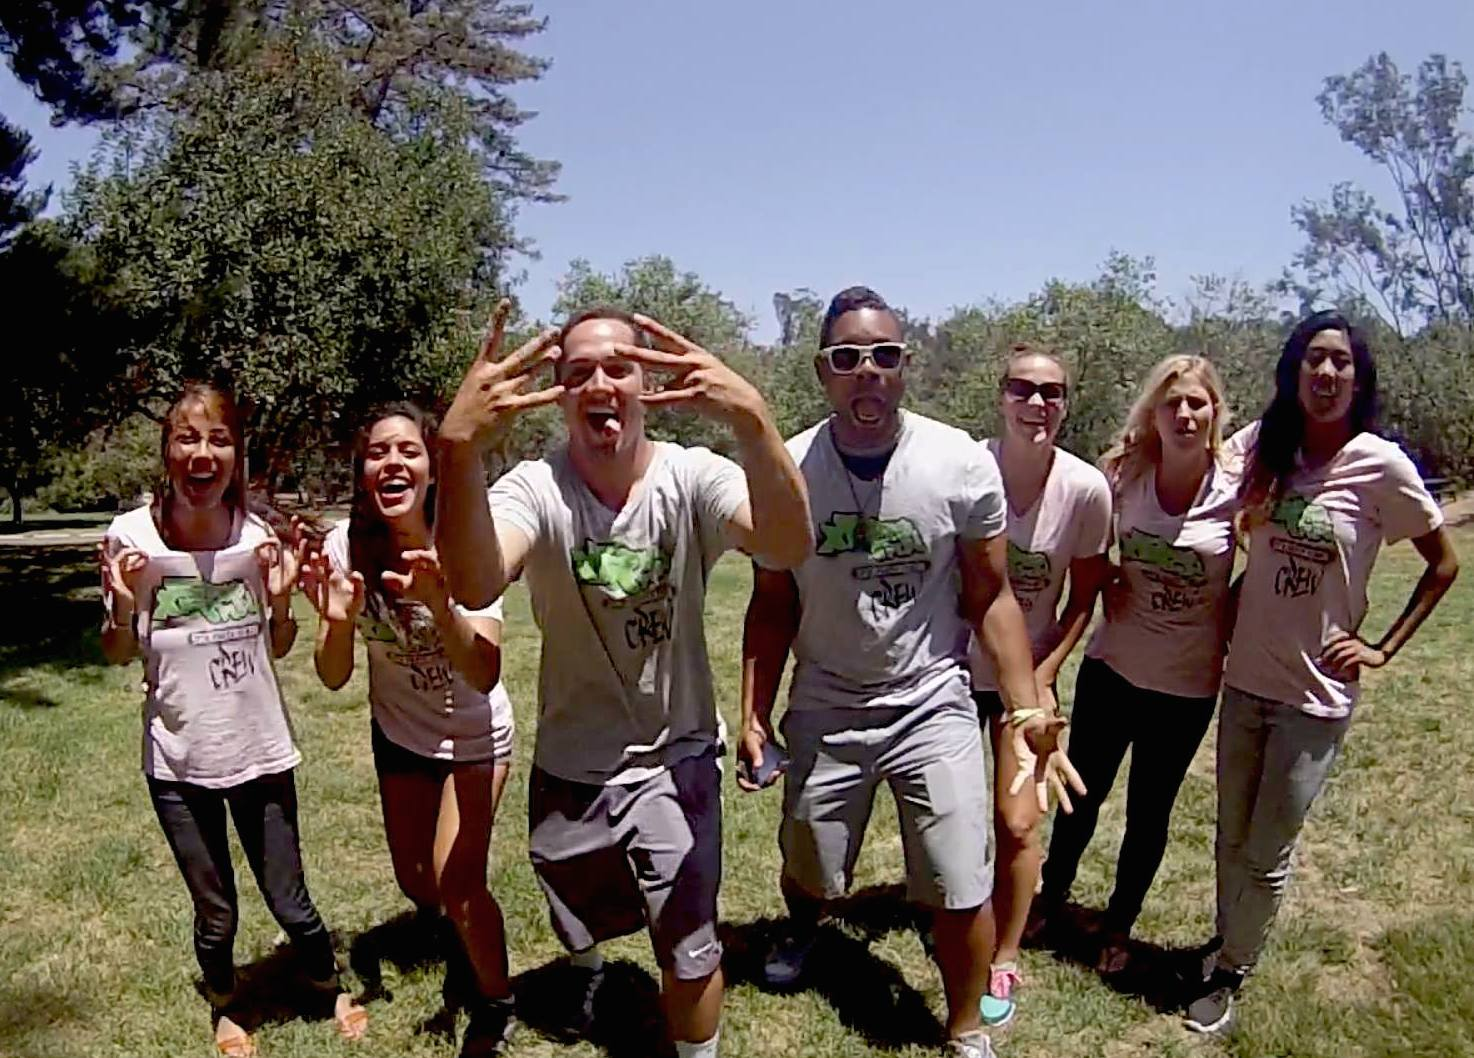 Xtreme Fun - Carlsbad, CA